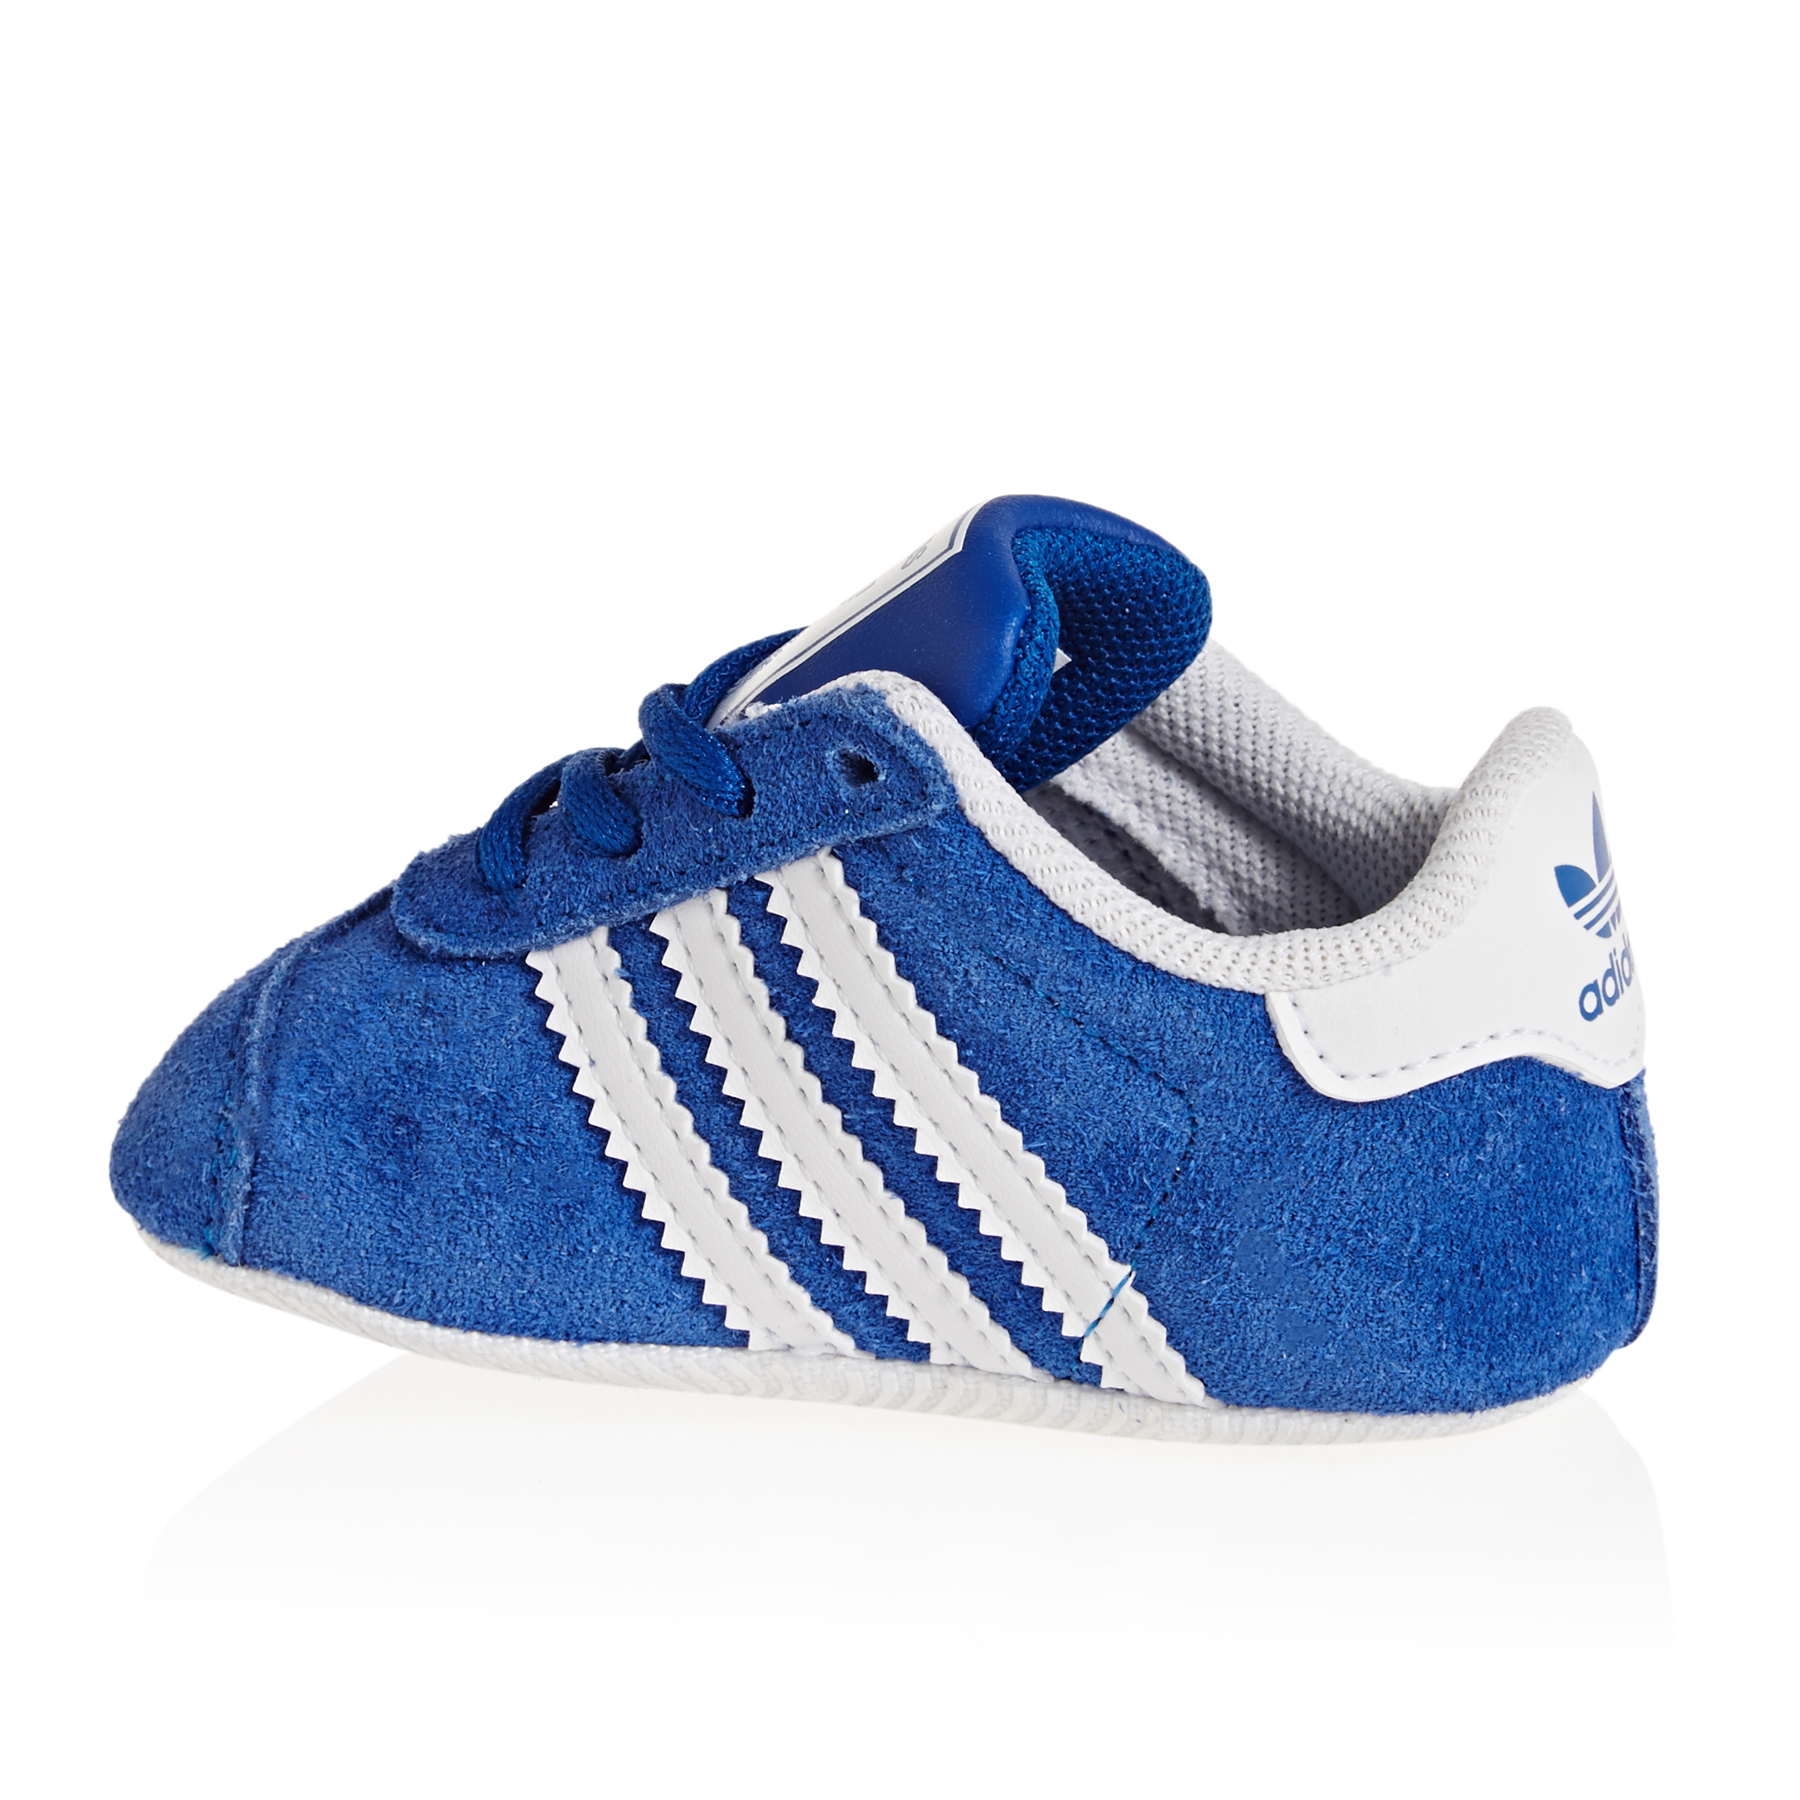 Chaussures Enfant Adidas Originals Gazelle Crib | Livraison